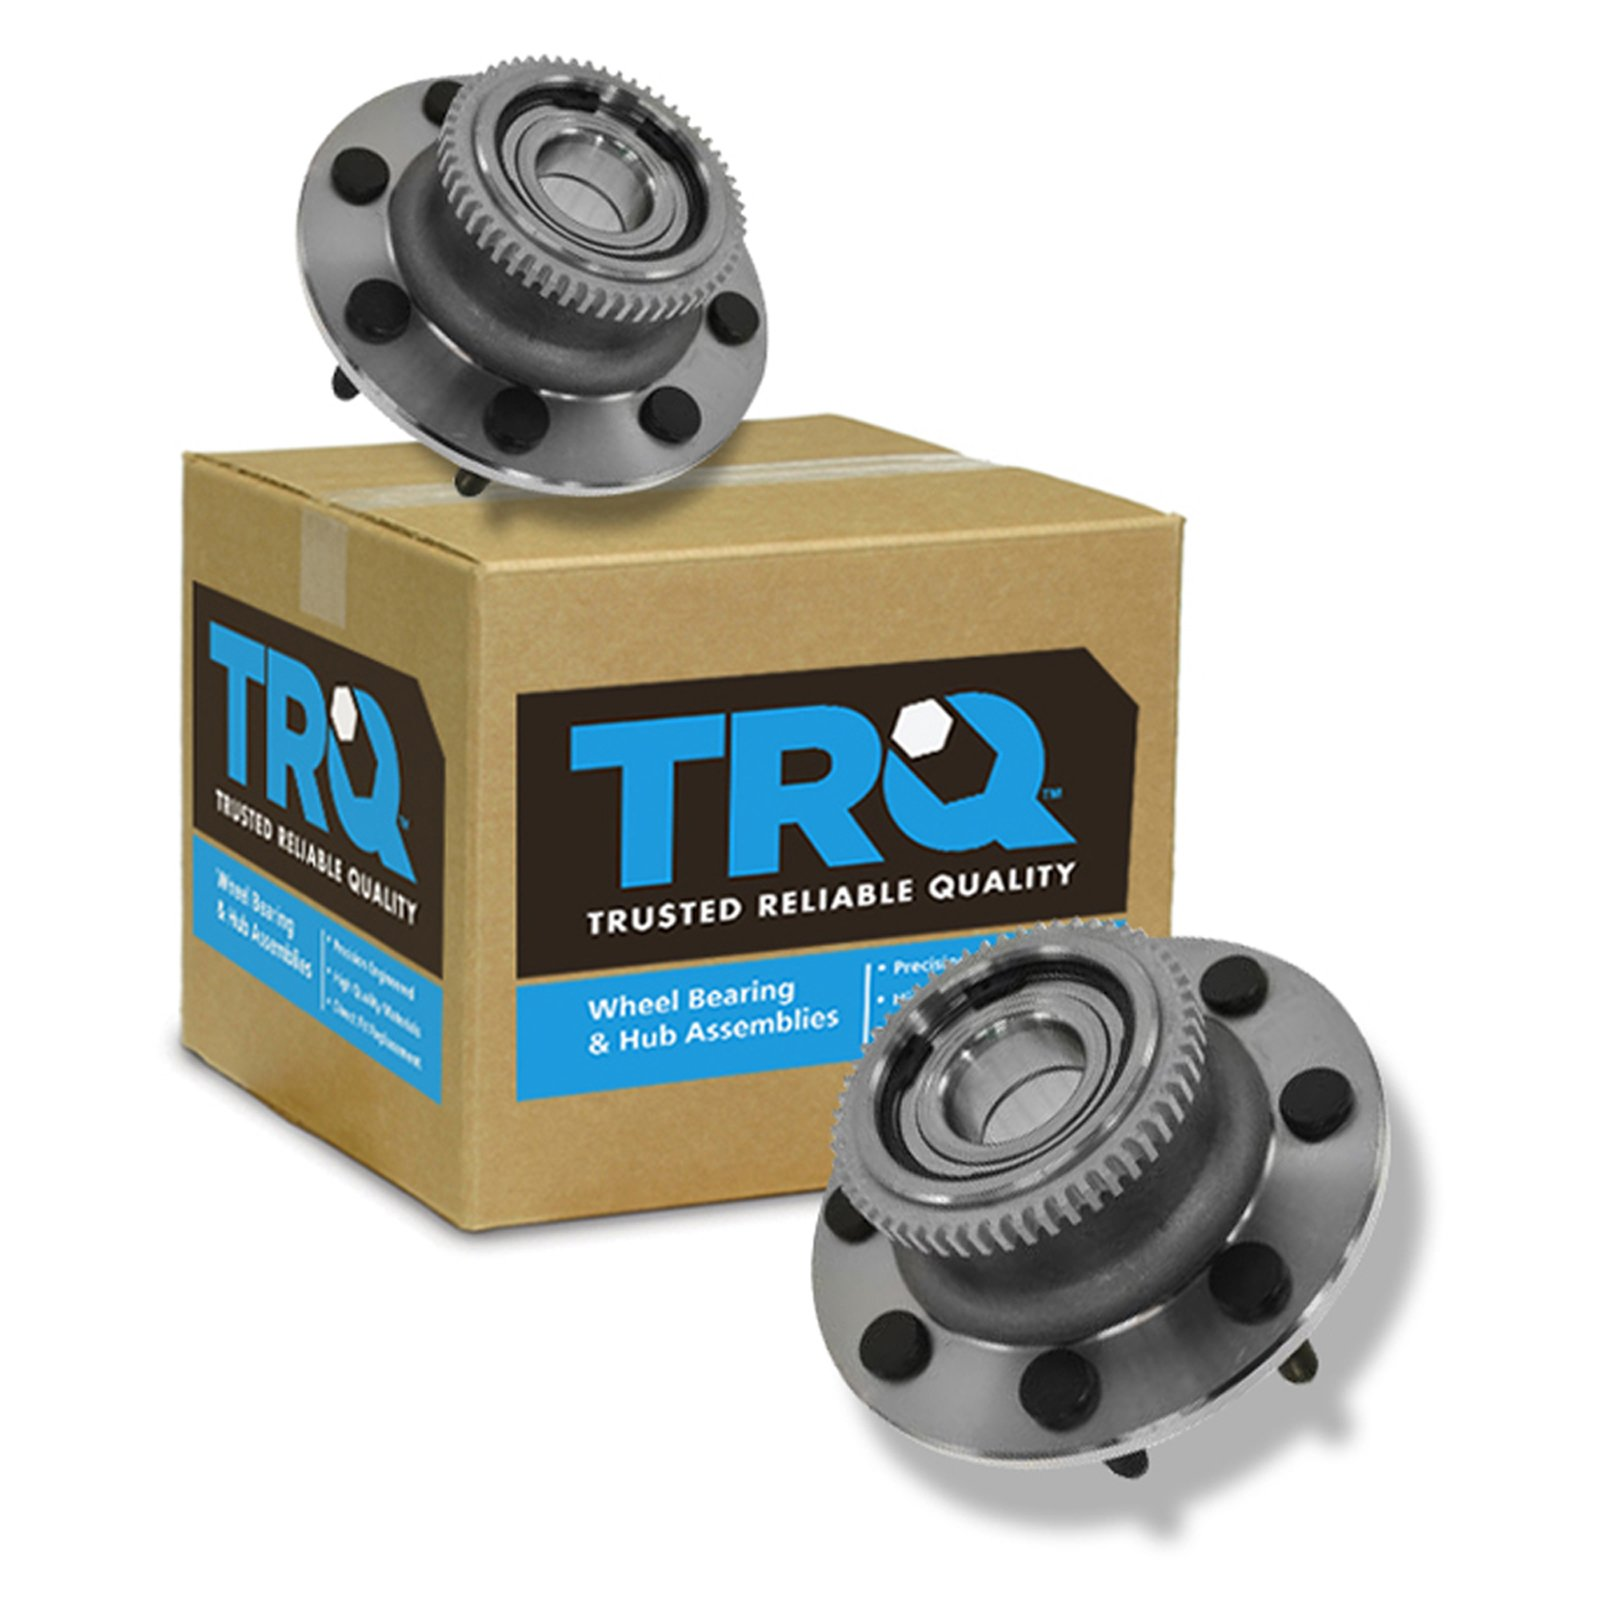 TRQ Front Wheel Hub & Bearing LH & RH Pair Set for 00-02 Dodge Ram 2500 3500 2WD